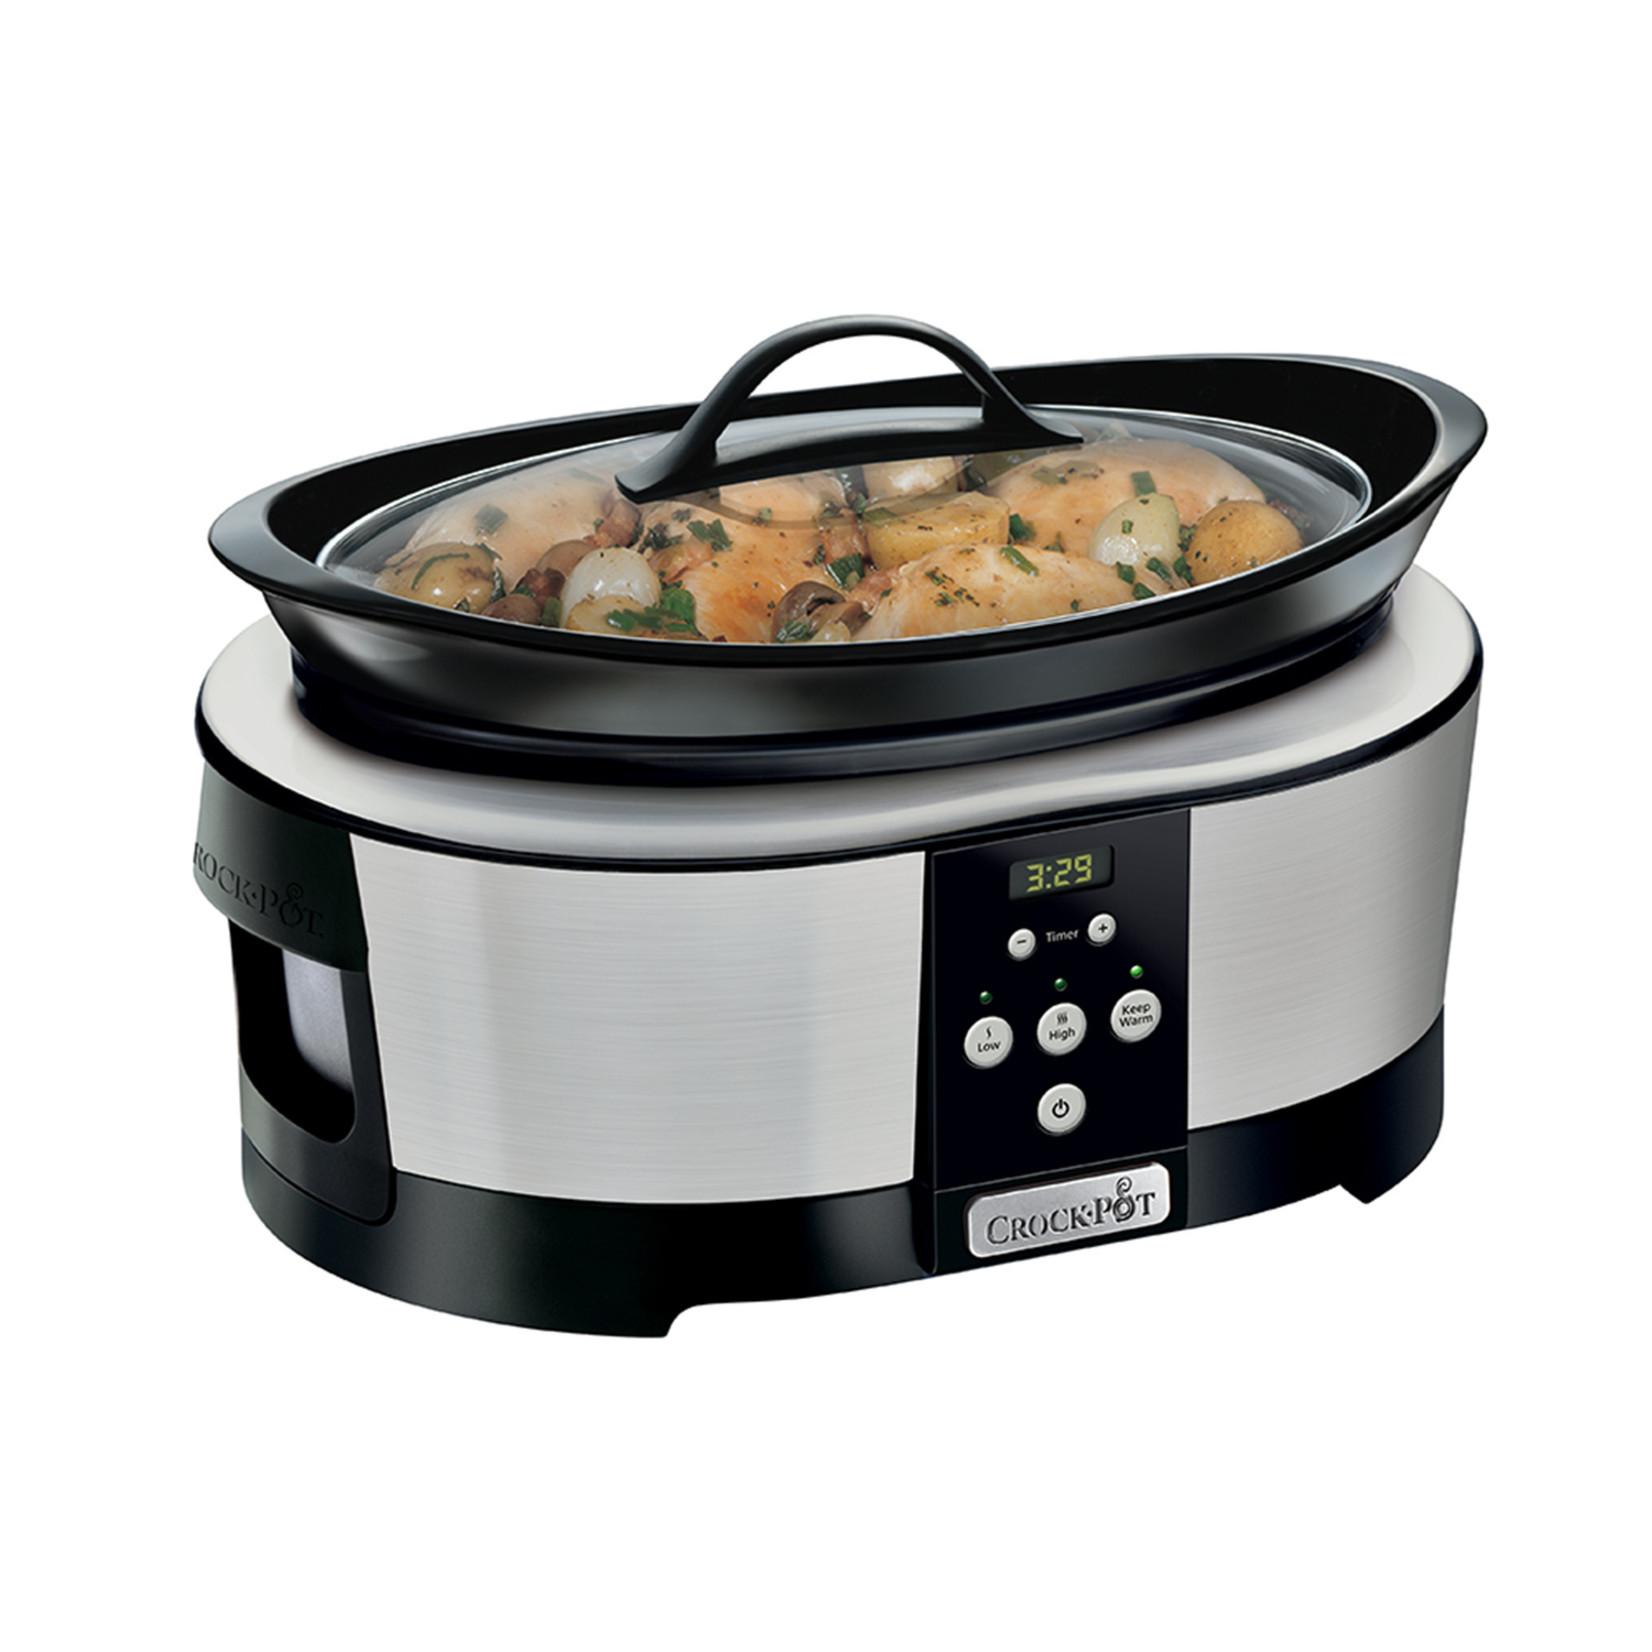 Crock-Pot Crock-Pot Premium slowcooker 5,7L programmeerbaar